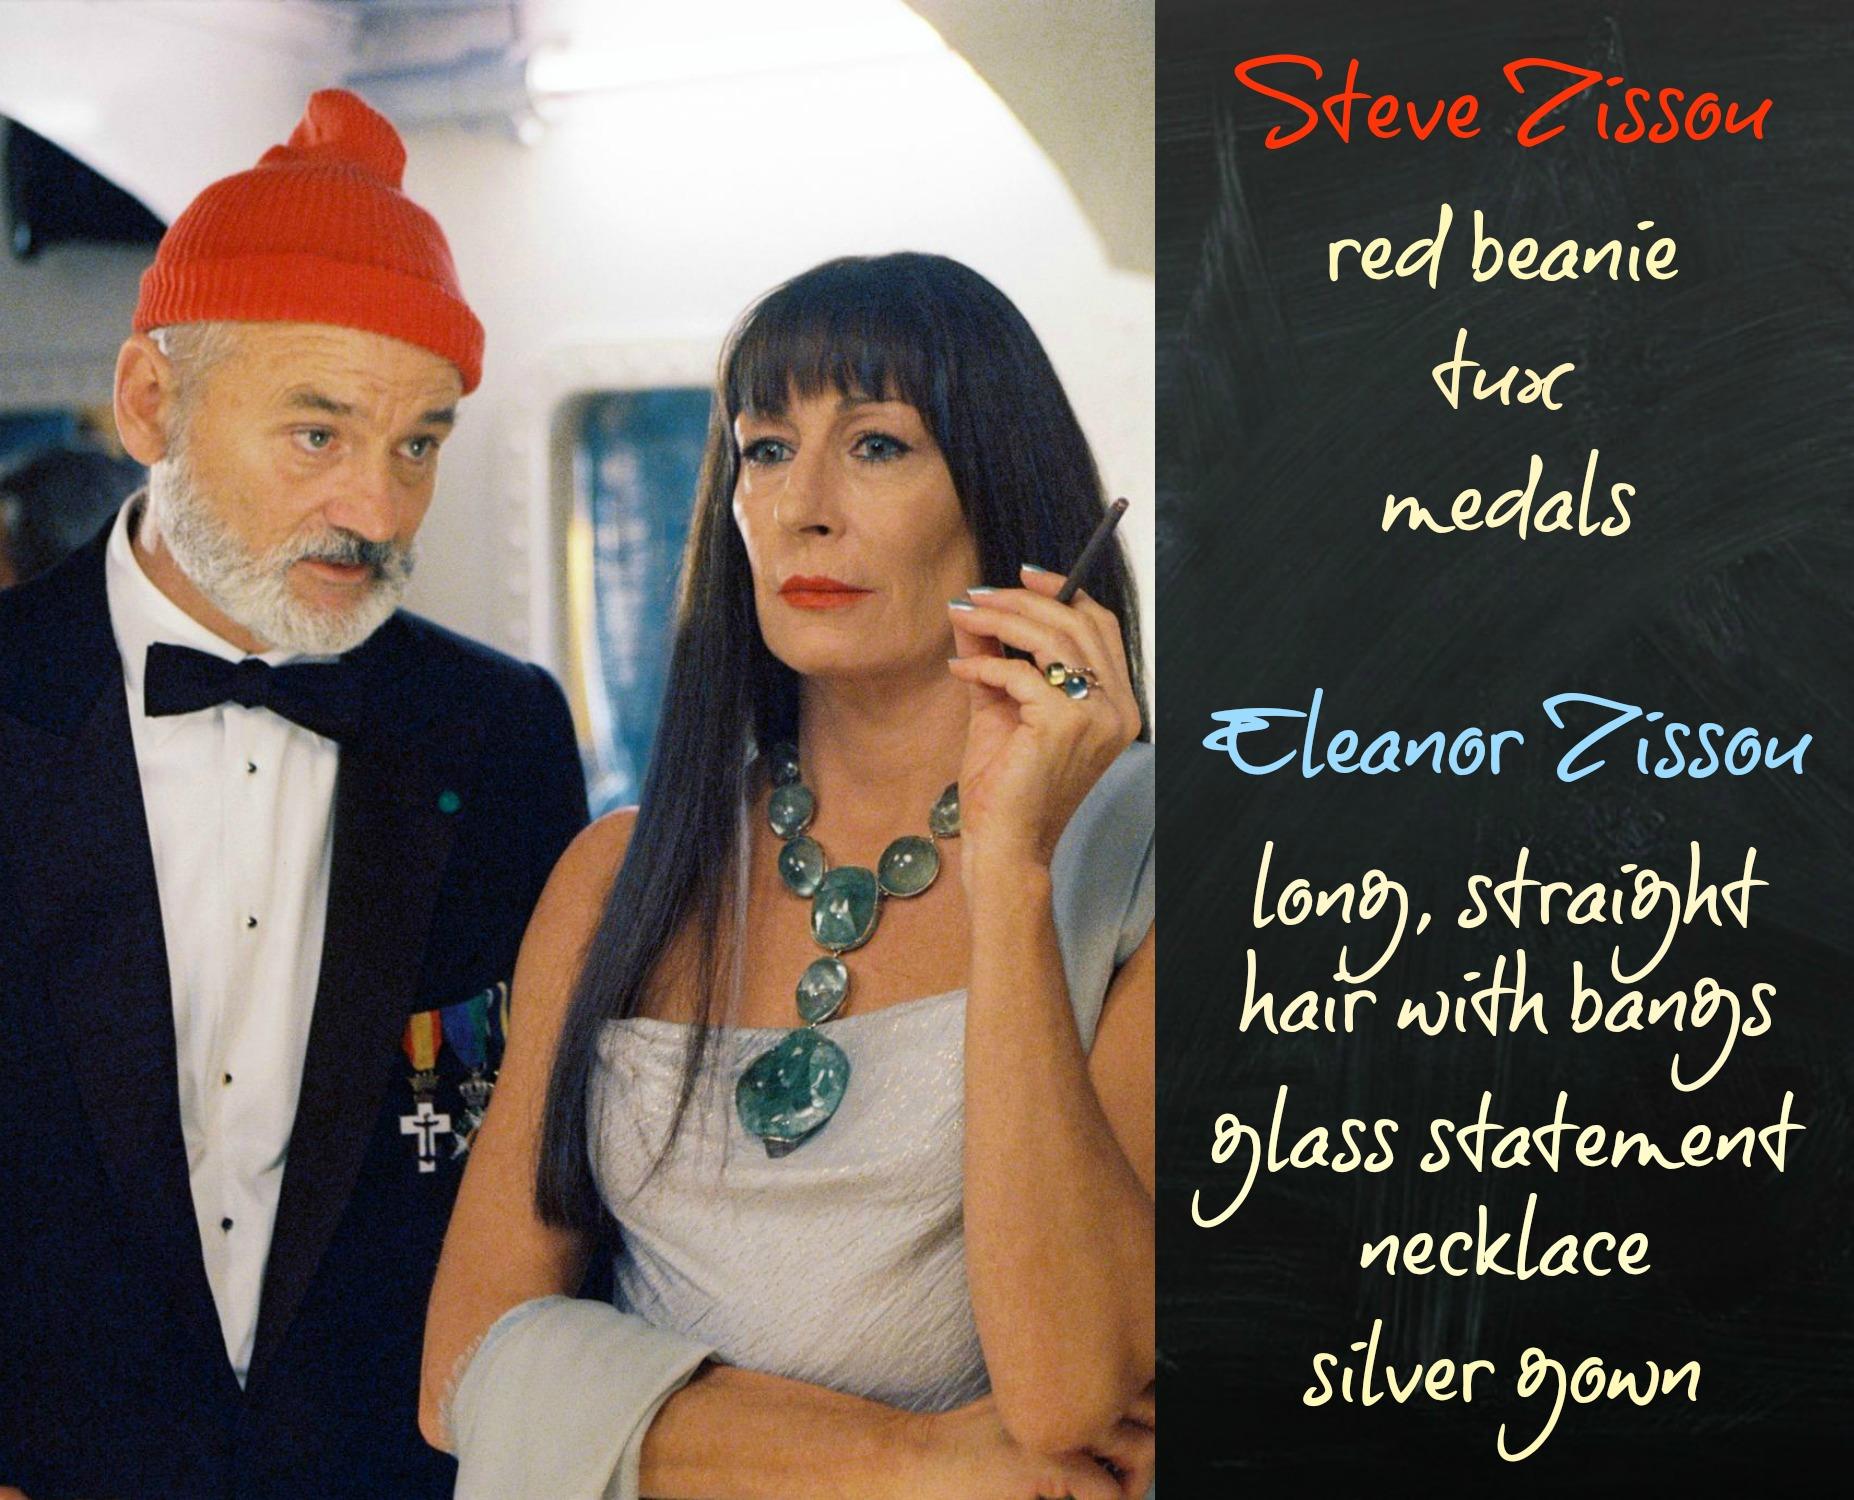 ... Aquatic with Steve Zissou · BMurray-LifeAquatic1-halloweencostume-sparrowsoirees  sc 1 st  The Sparrowu0027s Nest & Iu0027m Bill Murray halloween costume ideas | The Sparrowu0027s Nest